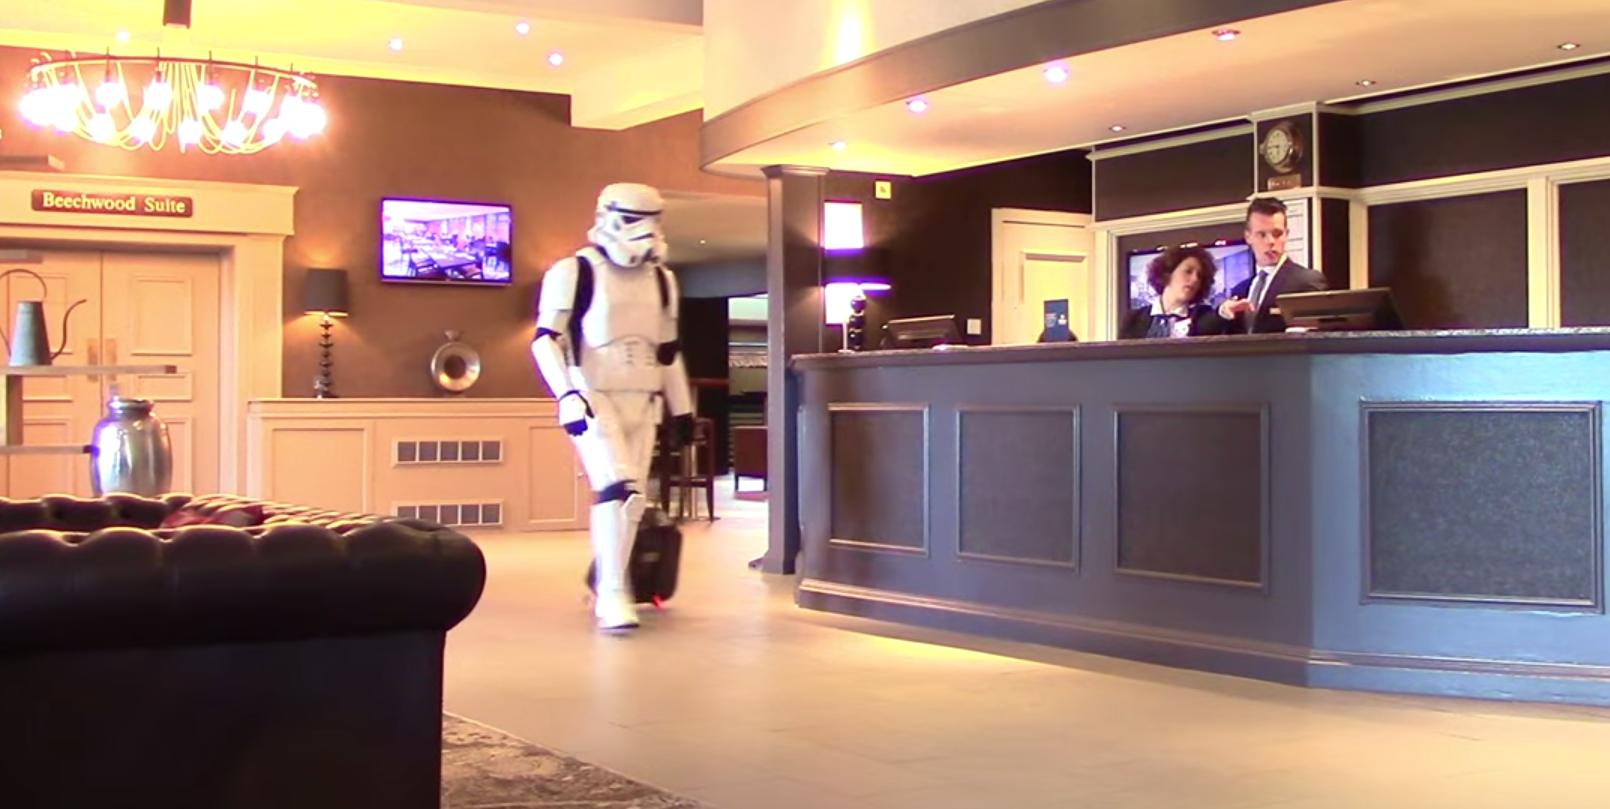 A Stormtrooper checks out the Hilton Tree Tops in the Granite City Comic-Con video